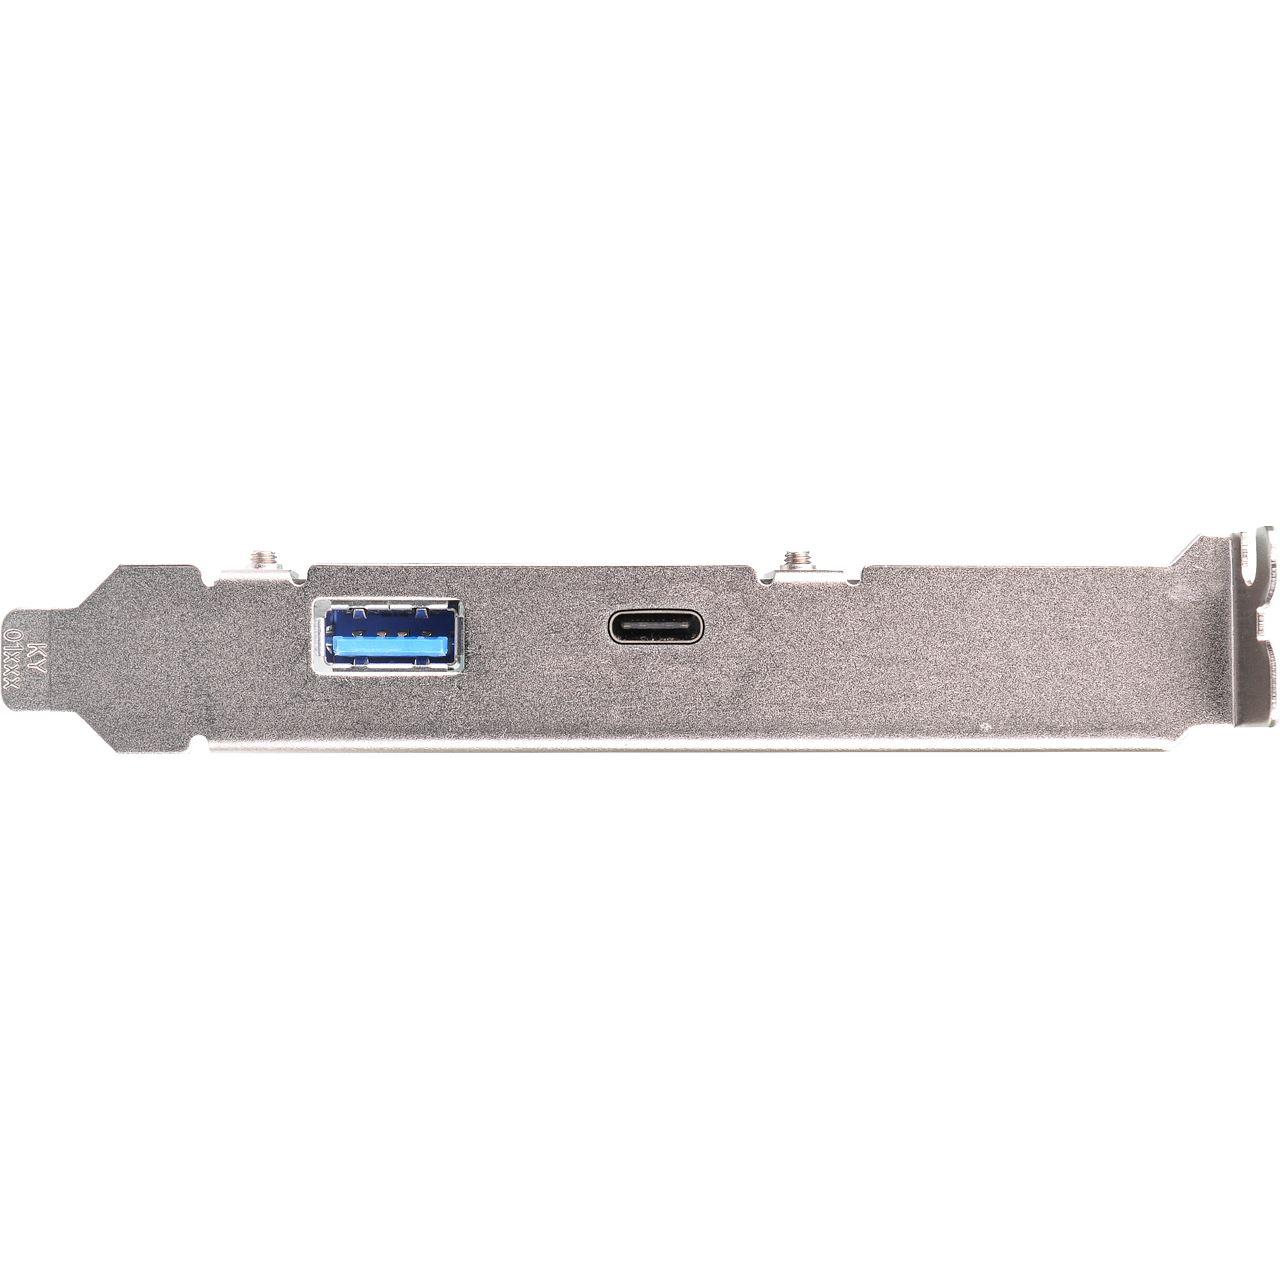 Asrock usb 3 1 a c 2 port pcie 2 0 x4 retail for Porte 1 3 2 3